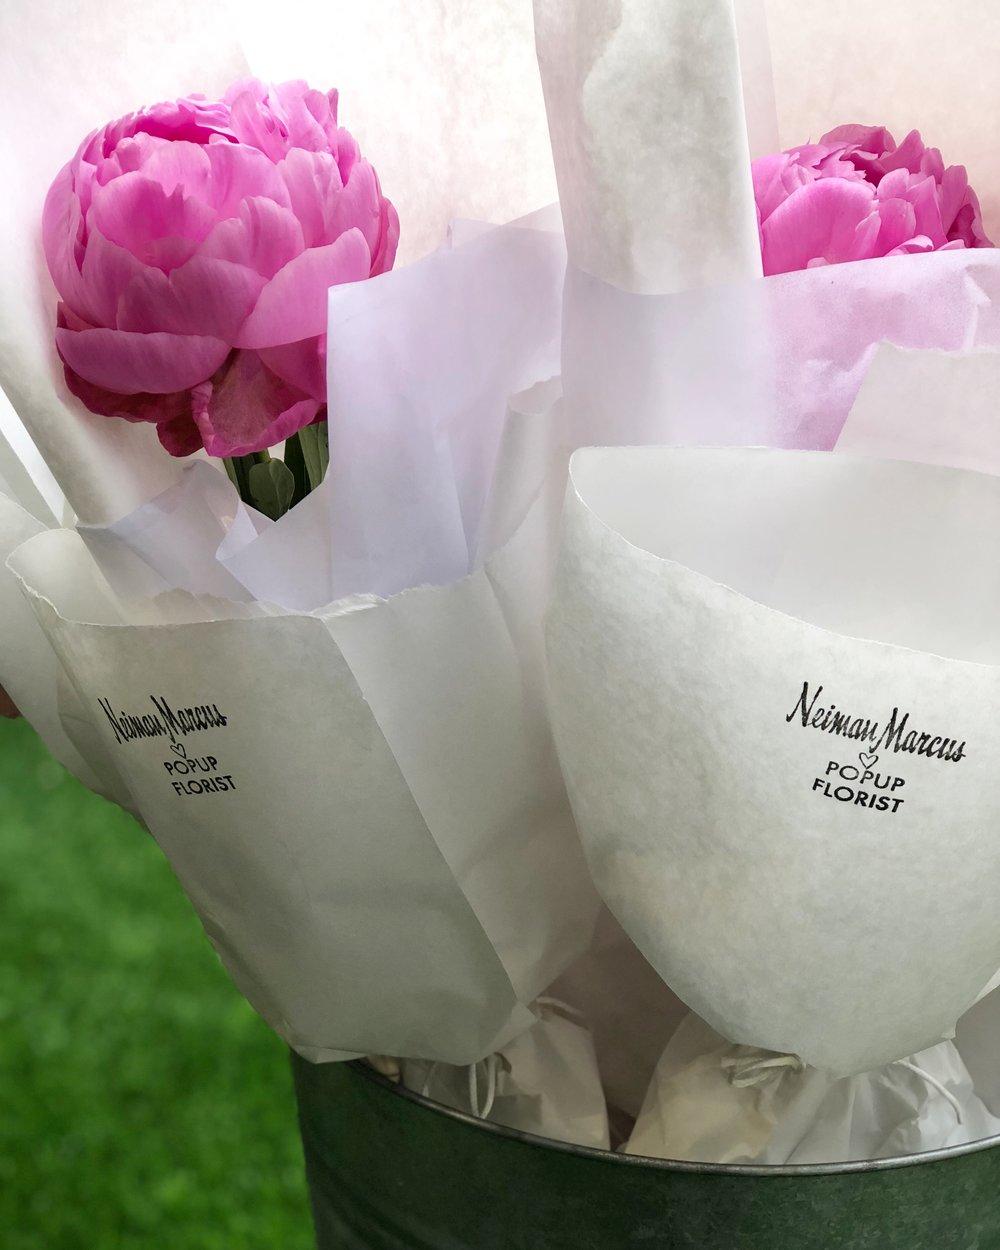 Neiman Marcus gifting